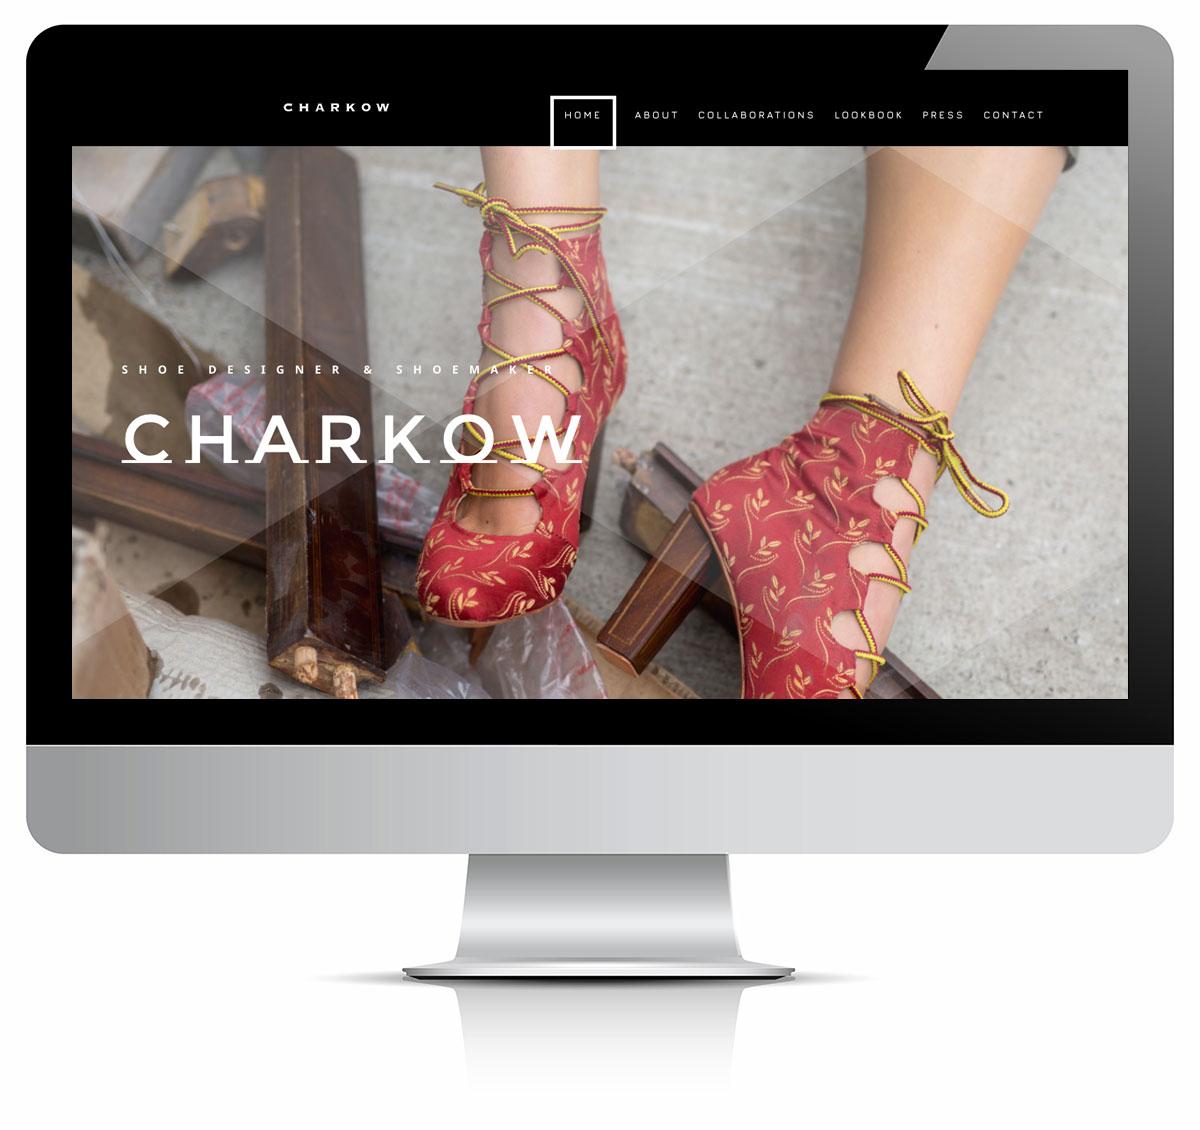 Charkow Shoes - Daniel Charkow